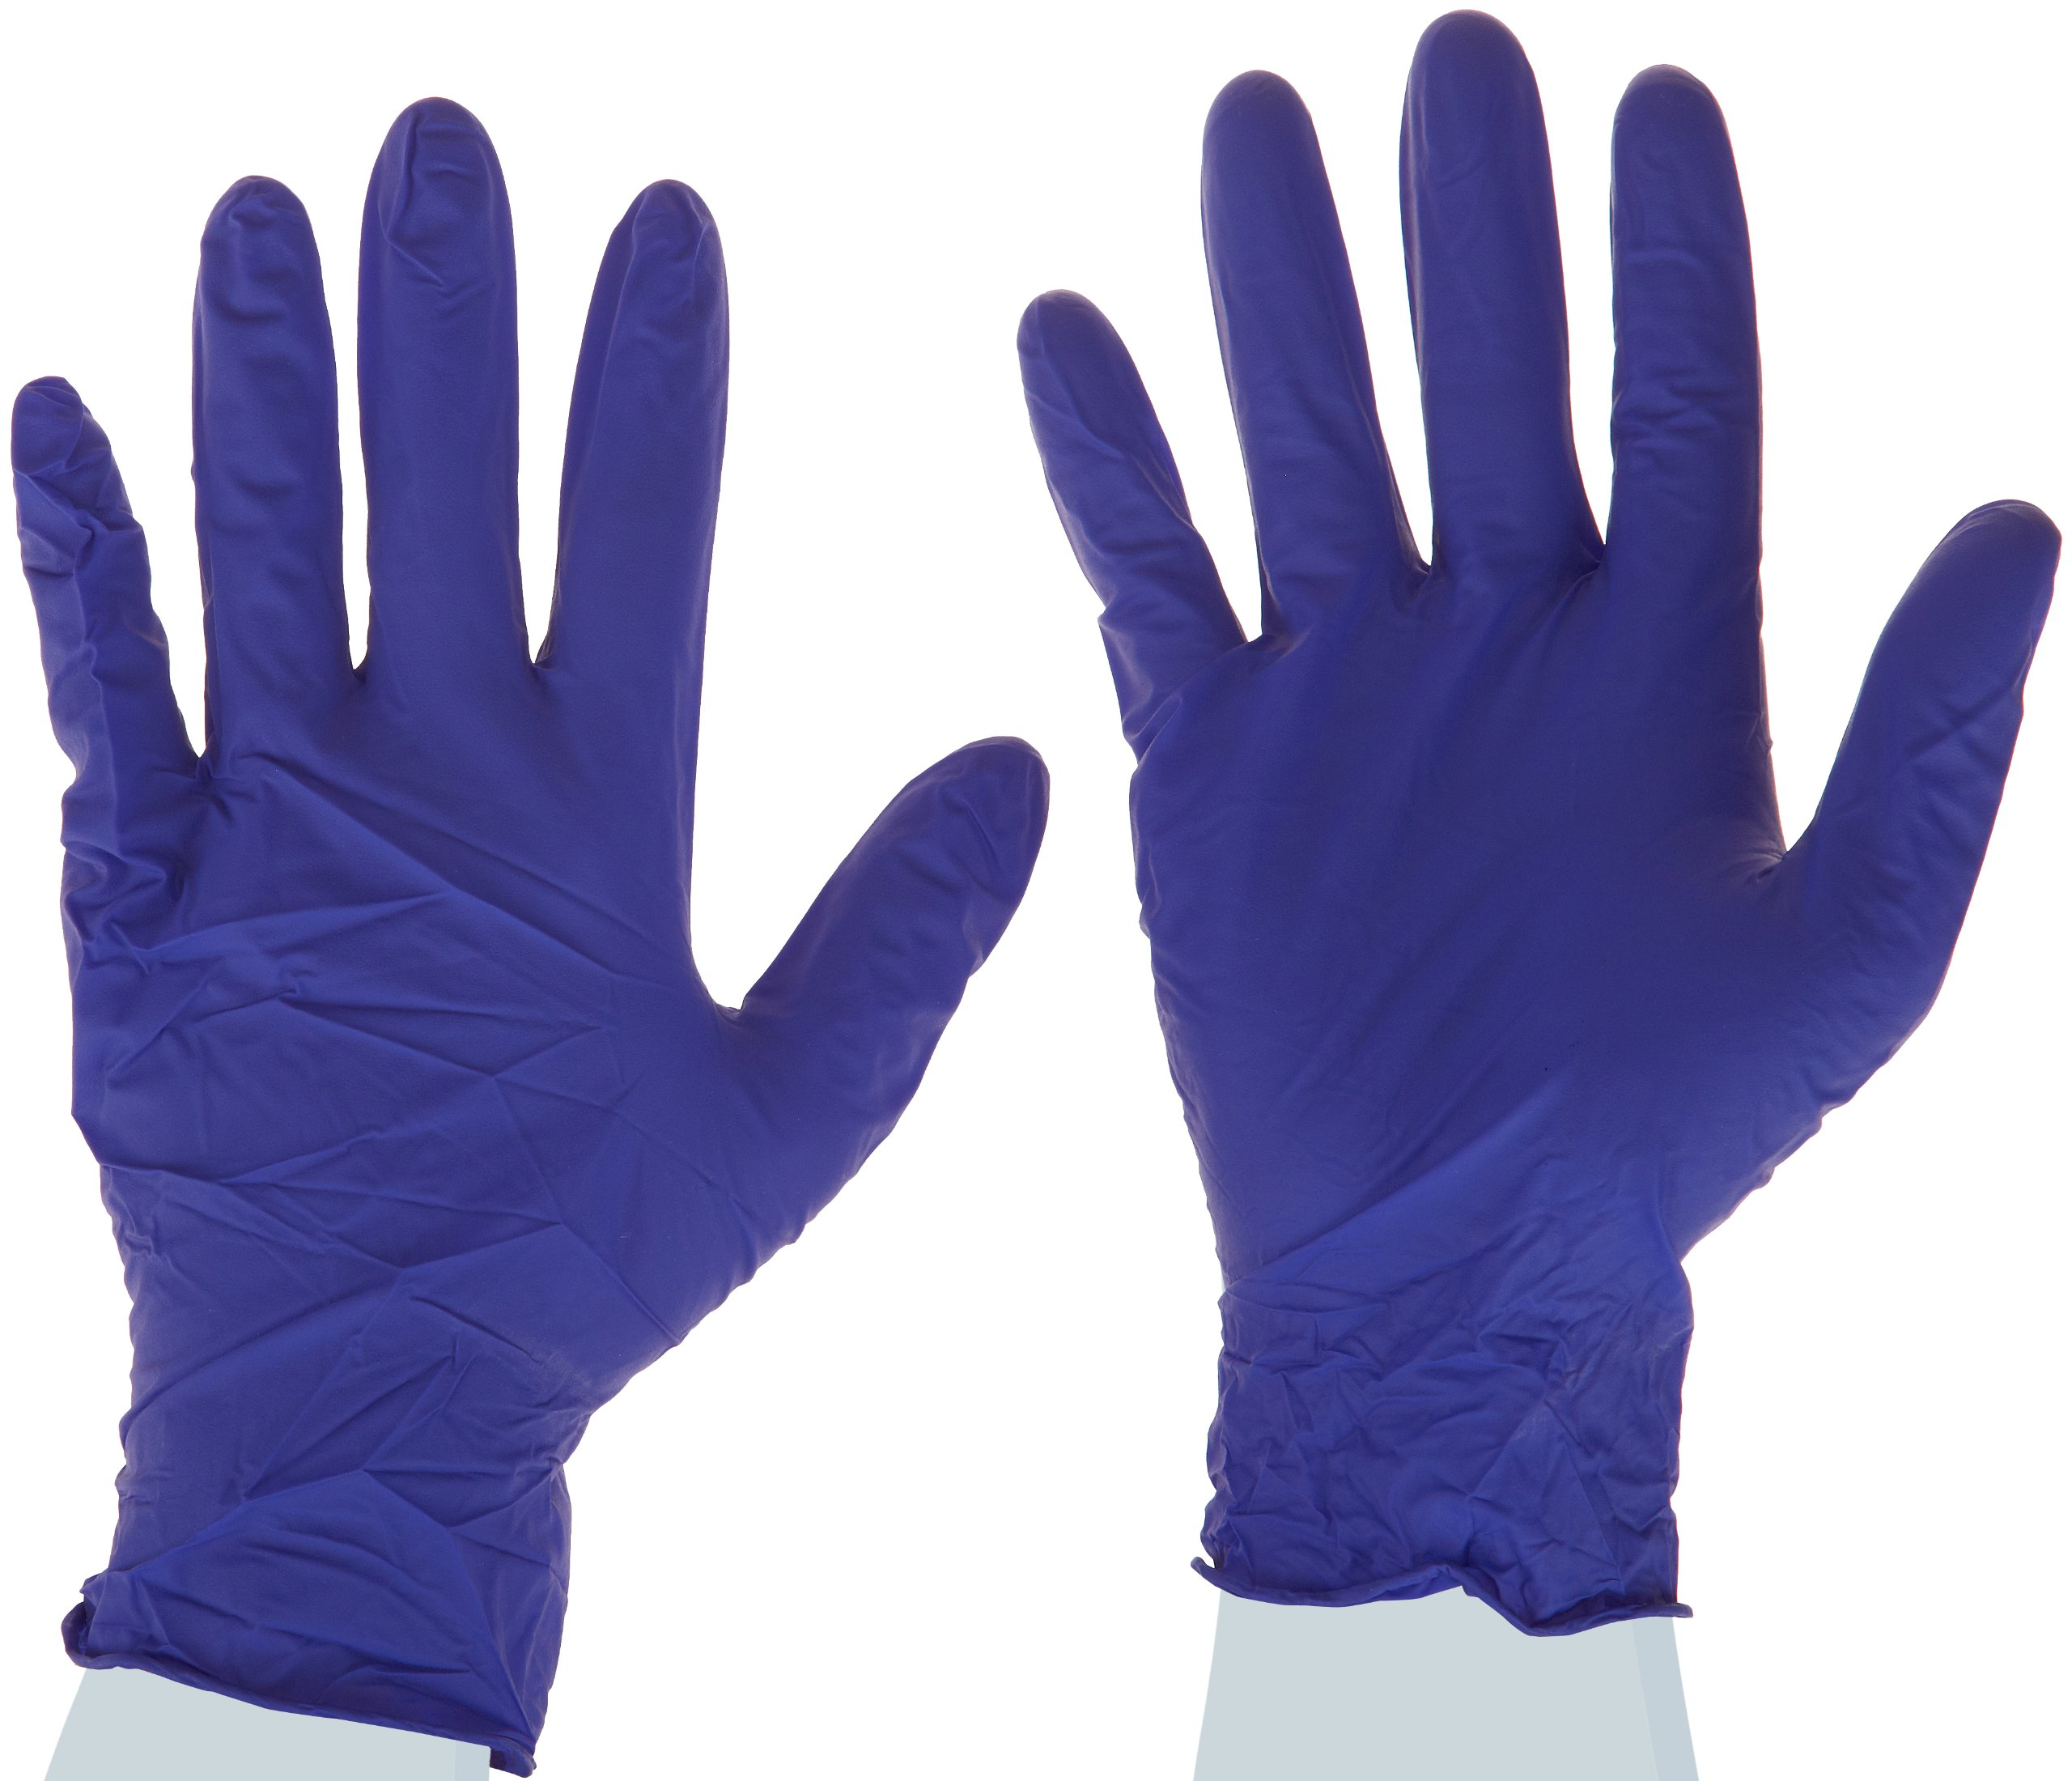 High Five Cobalt X N213 Series N21 Nitrile Exam Glove, Large (Case of 10) by High Five